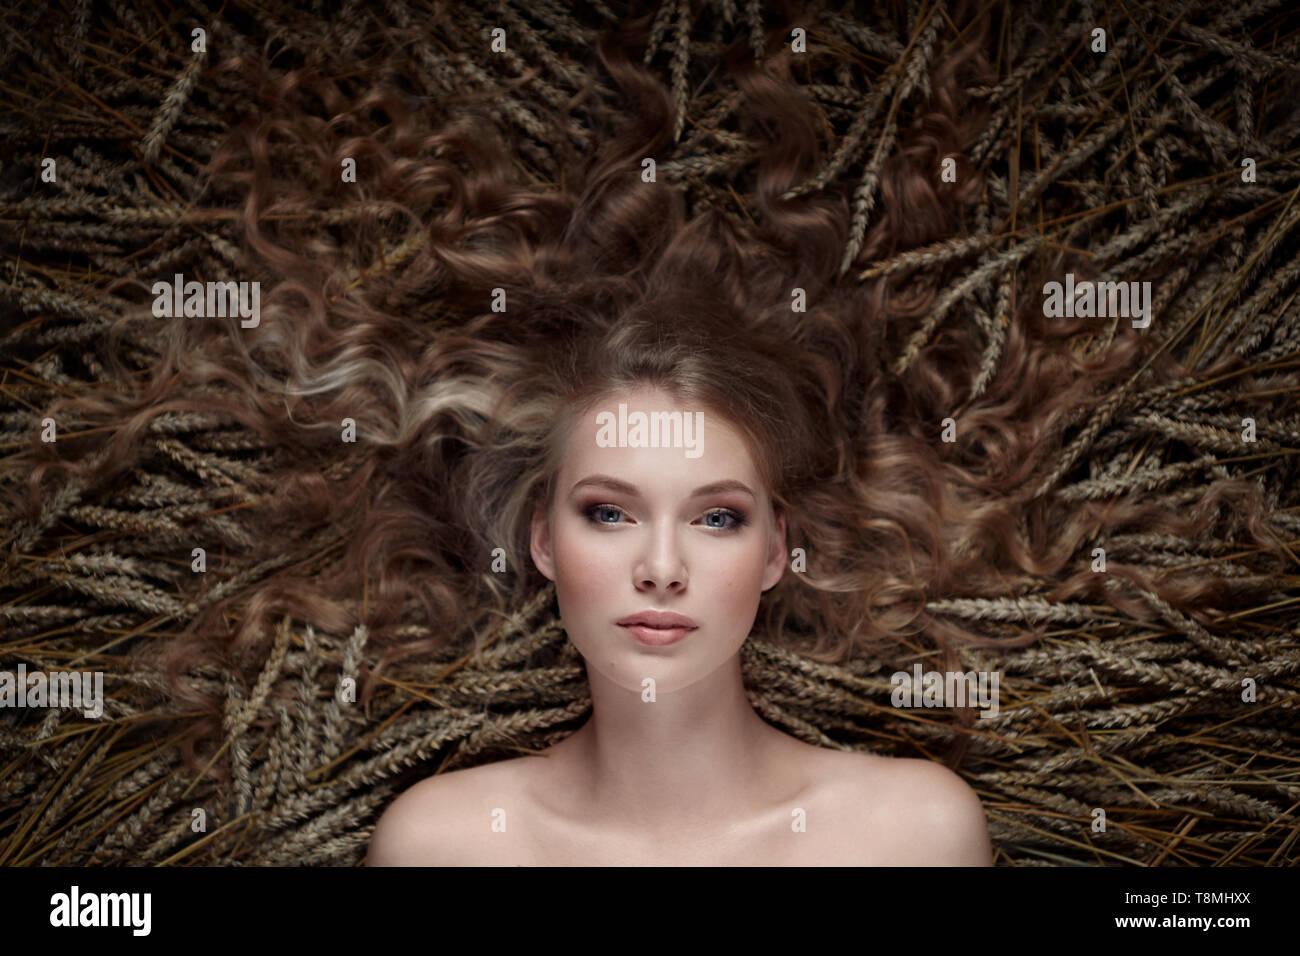 Portrait of a girl in ears - Stock Image